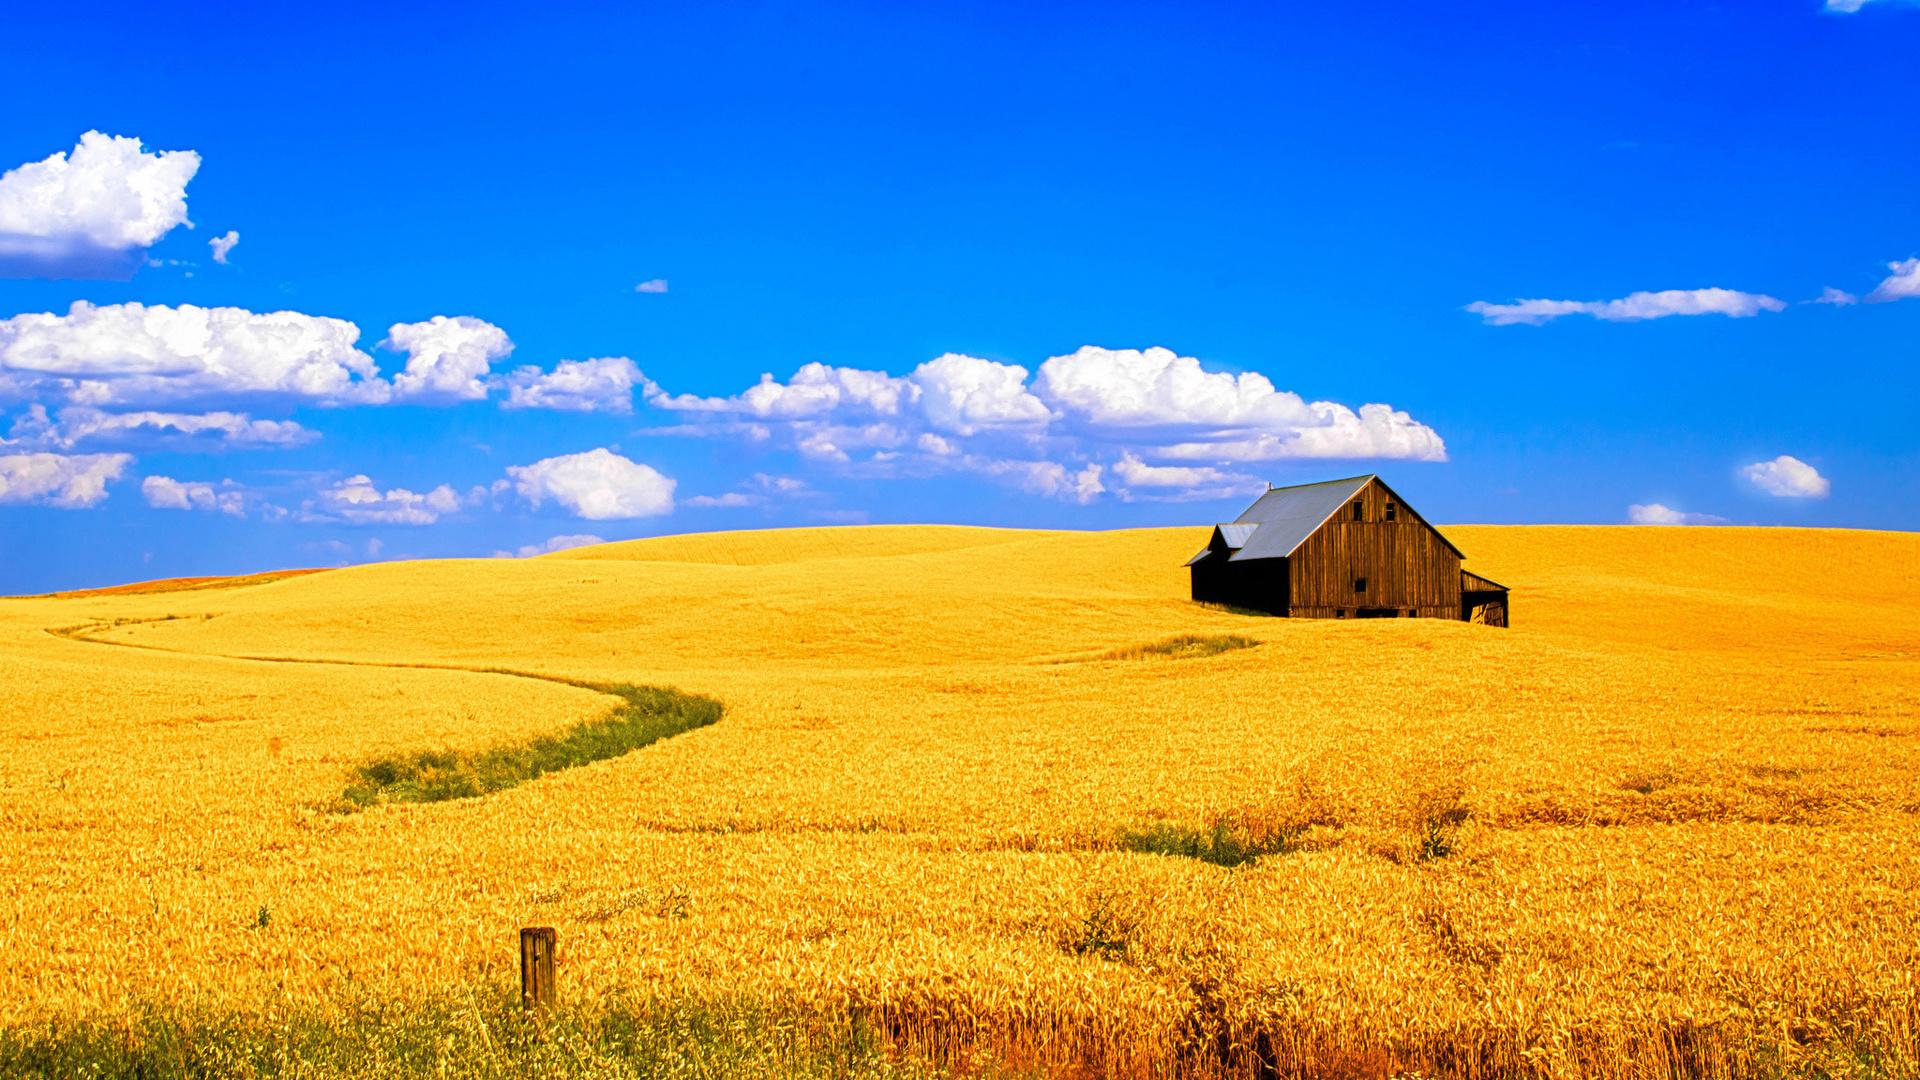 поле, пшеница, дом, небо, облака, пейзаж